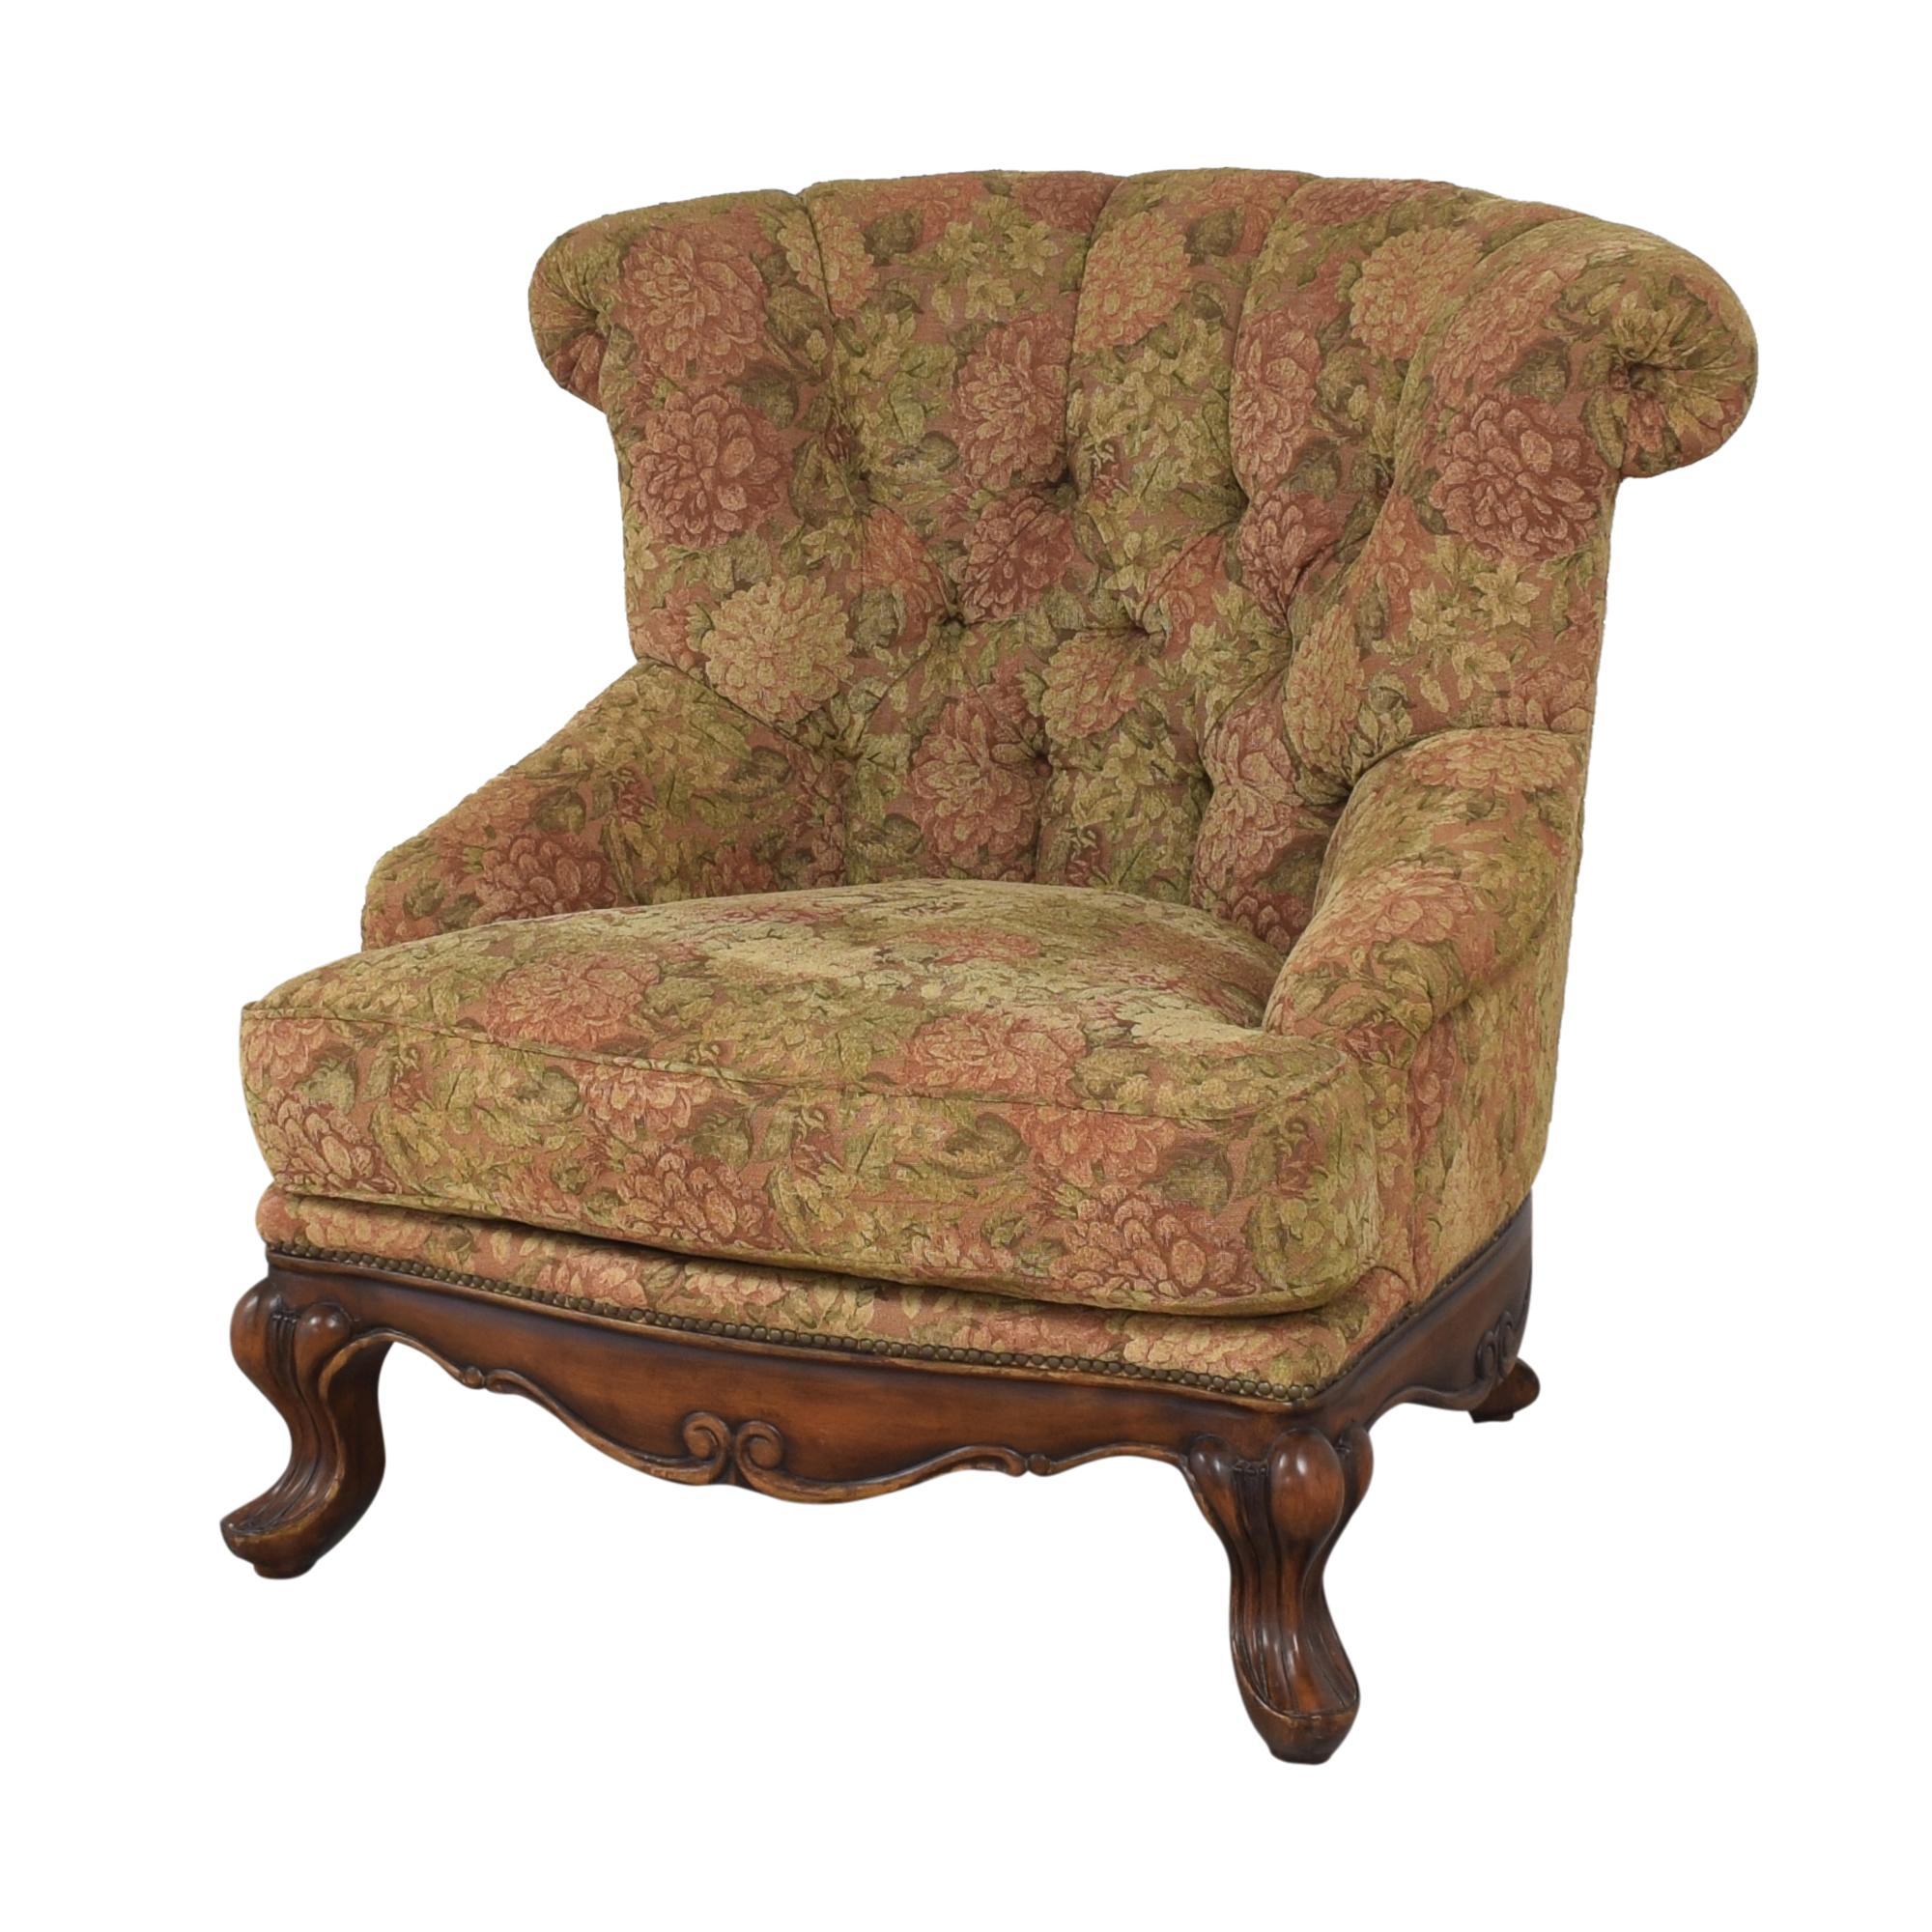 Schnadig Schnadig Compositions Bazille Chair discount